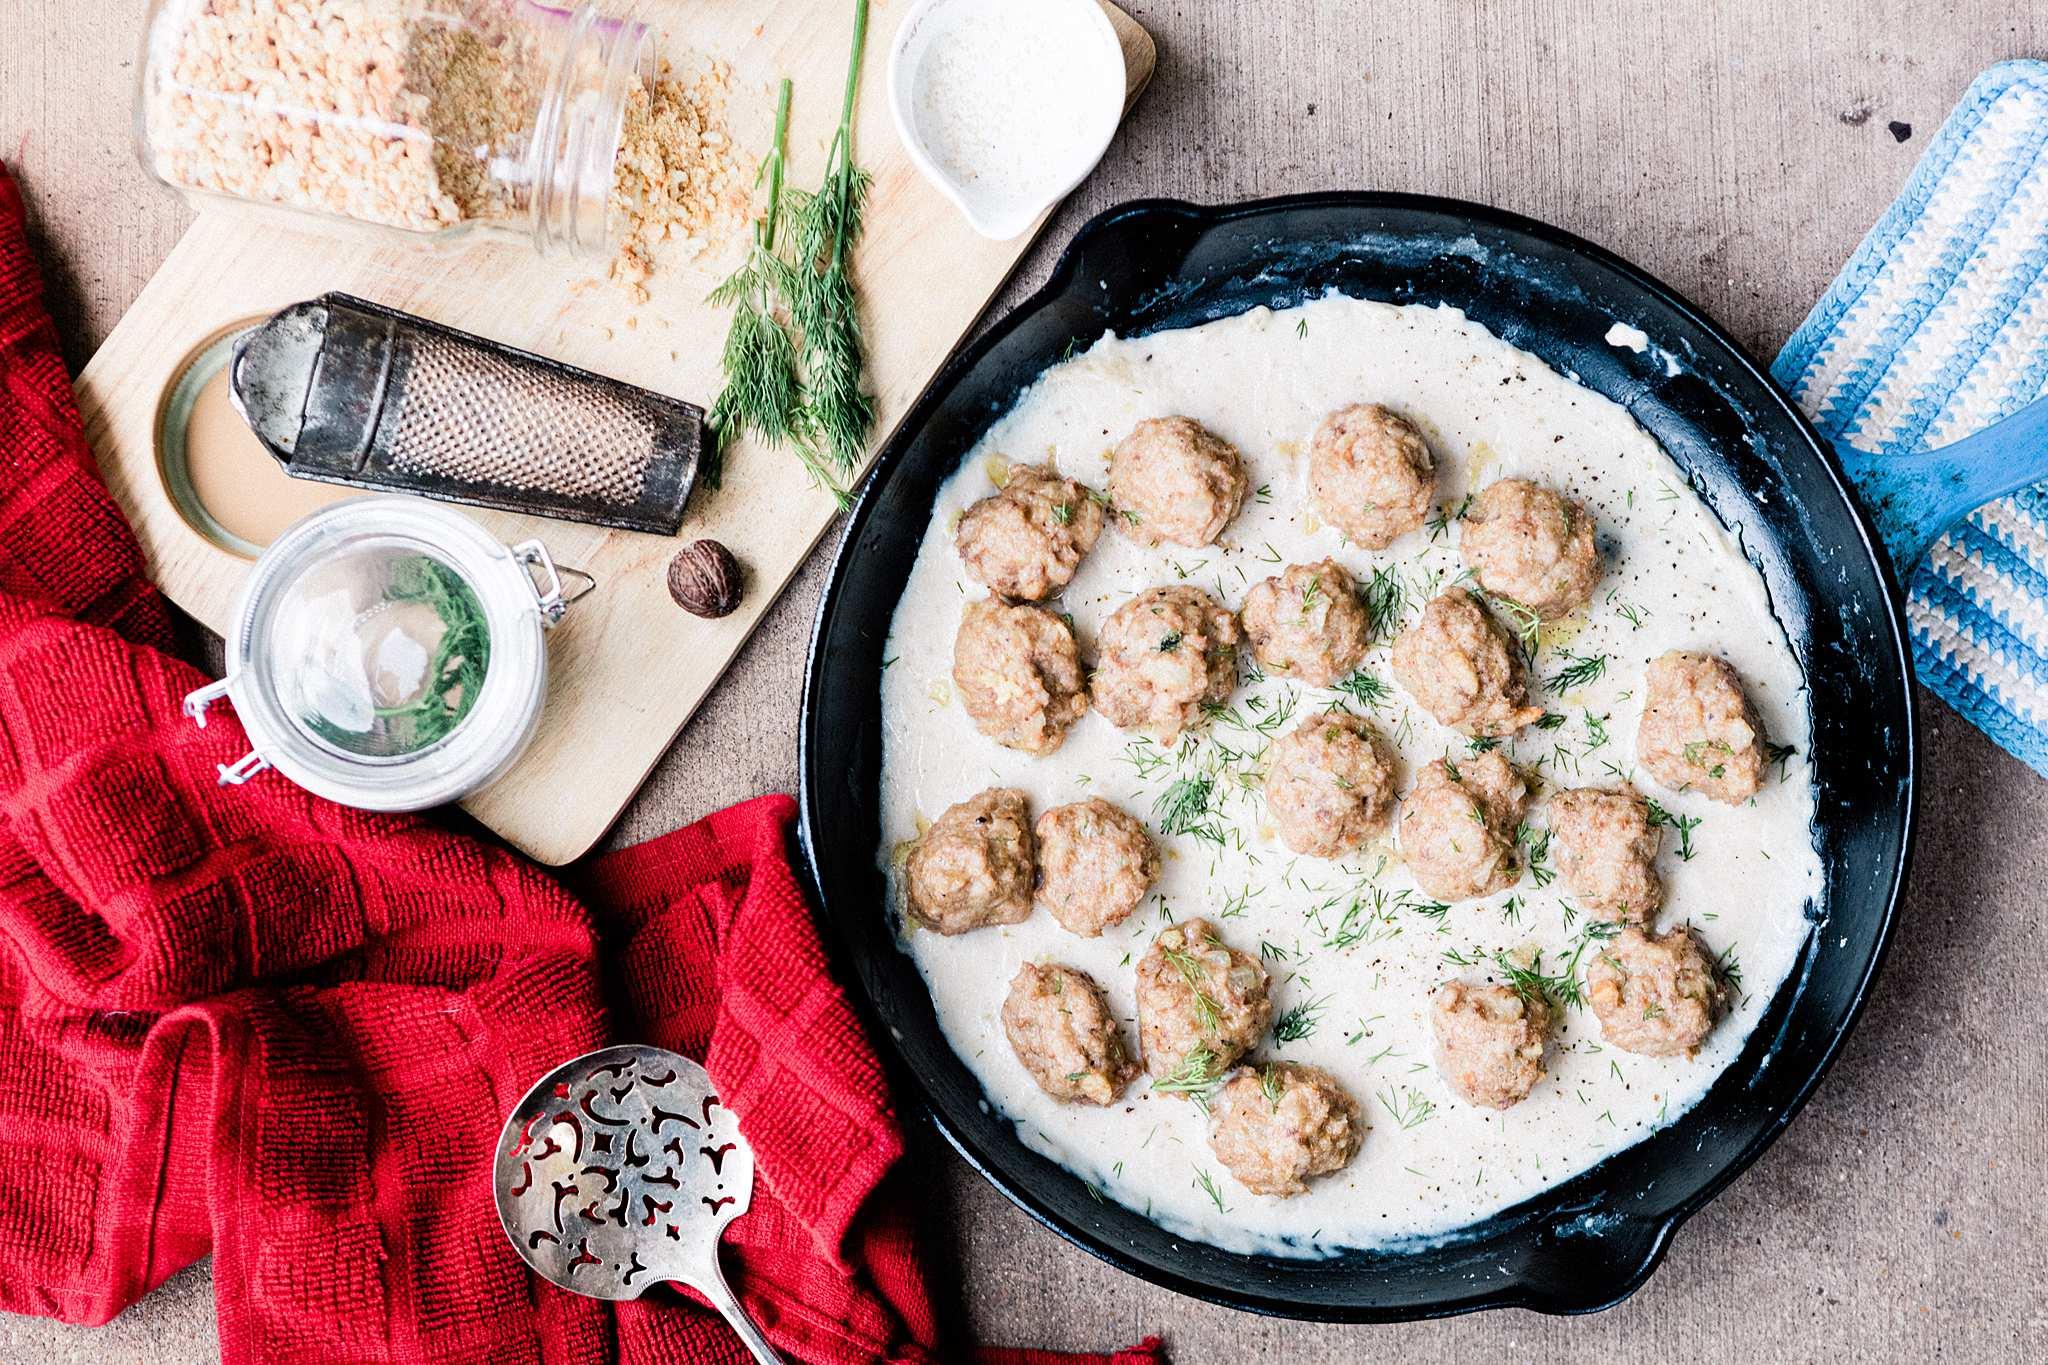 Swedish Meatballs (Kjottboller) - Let's Taco Bout It Blog